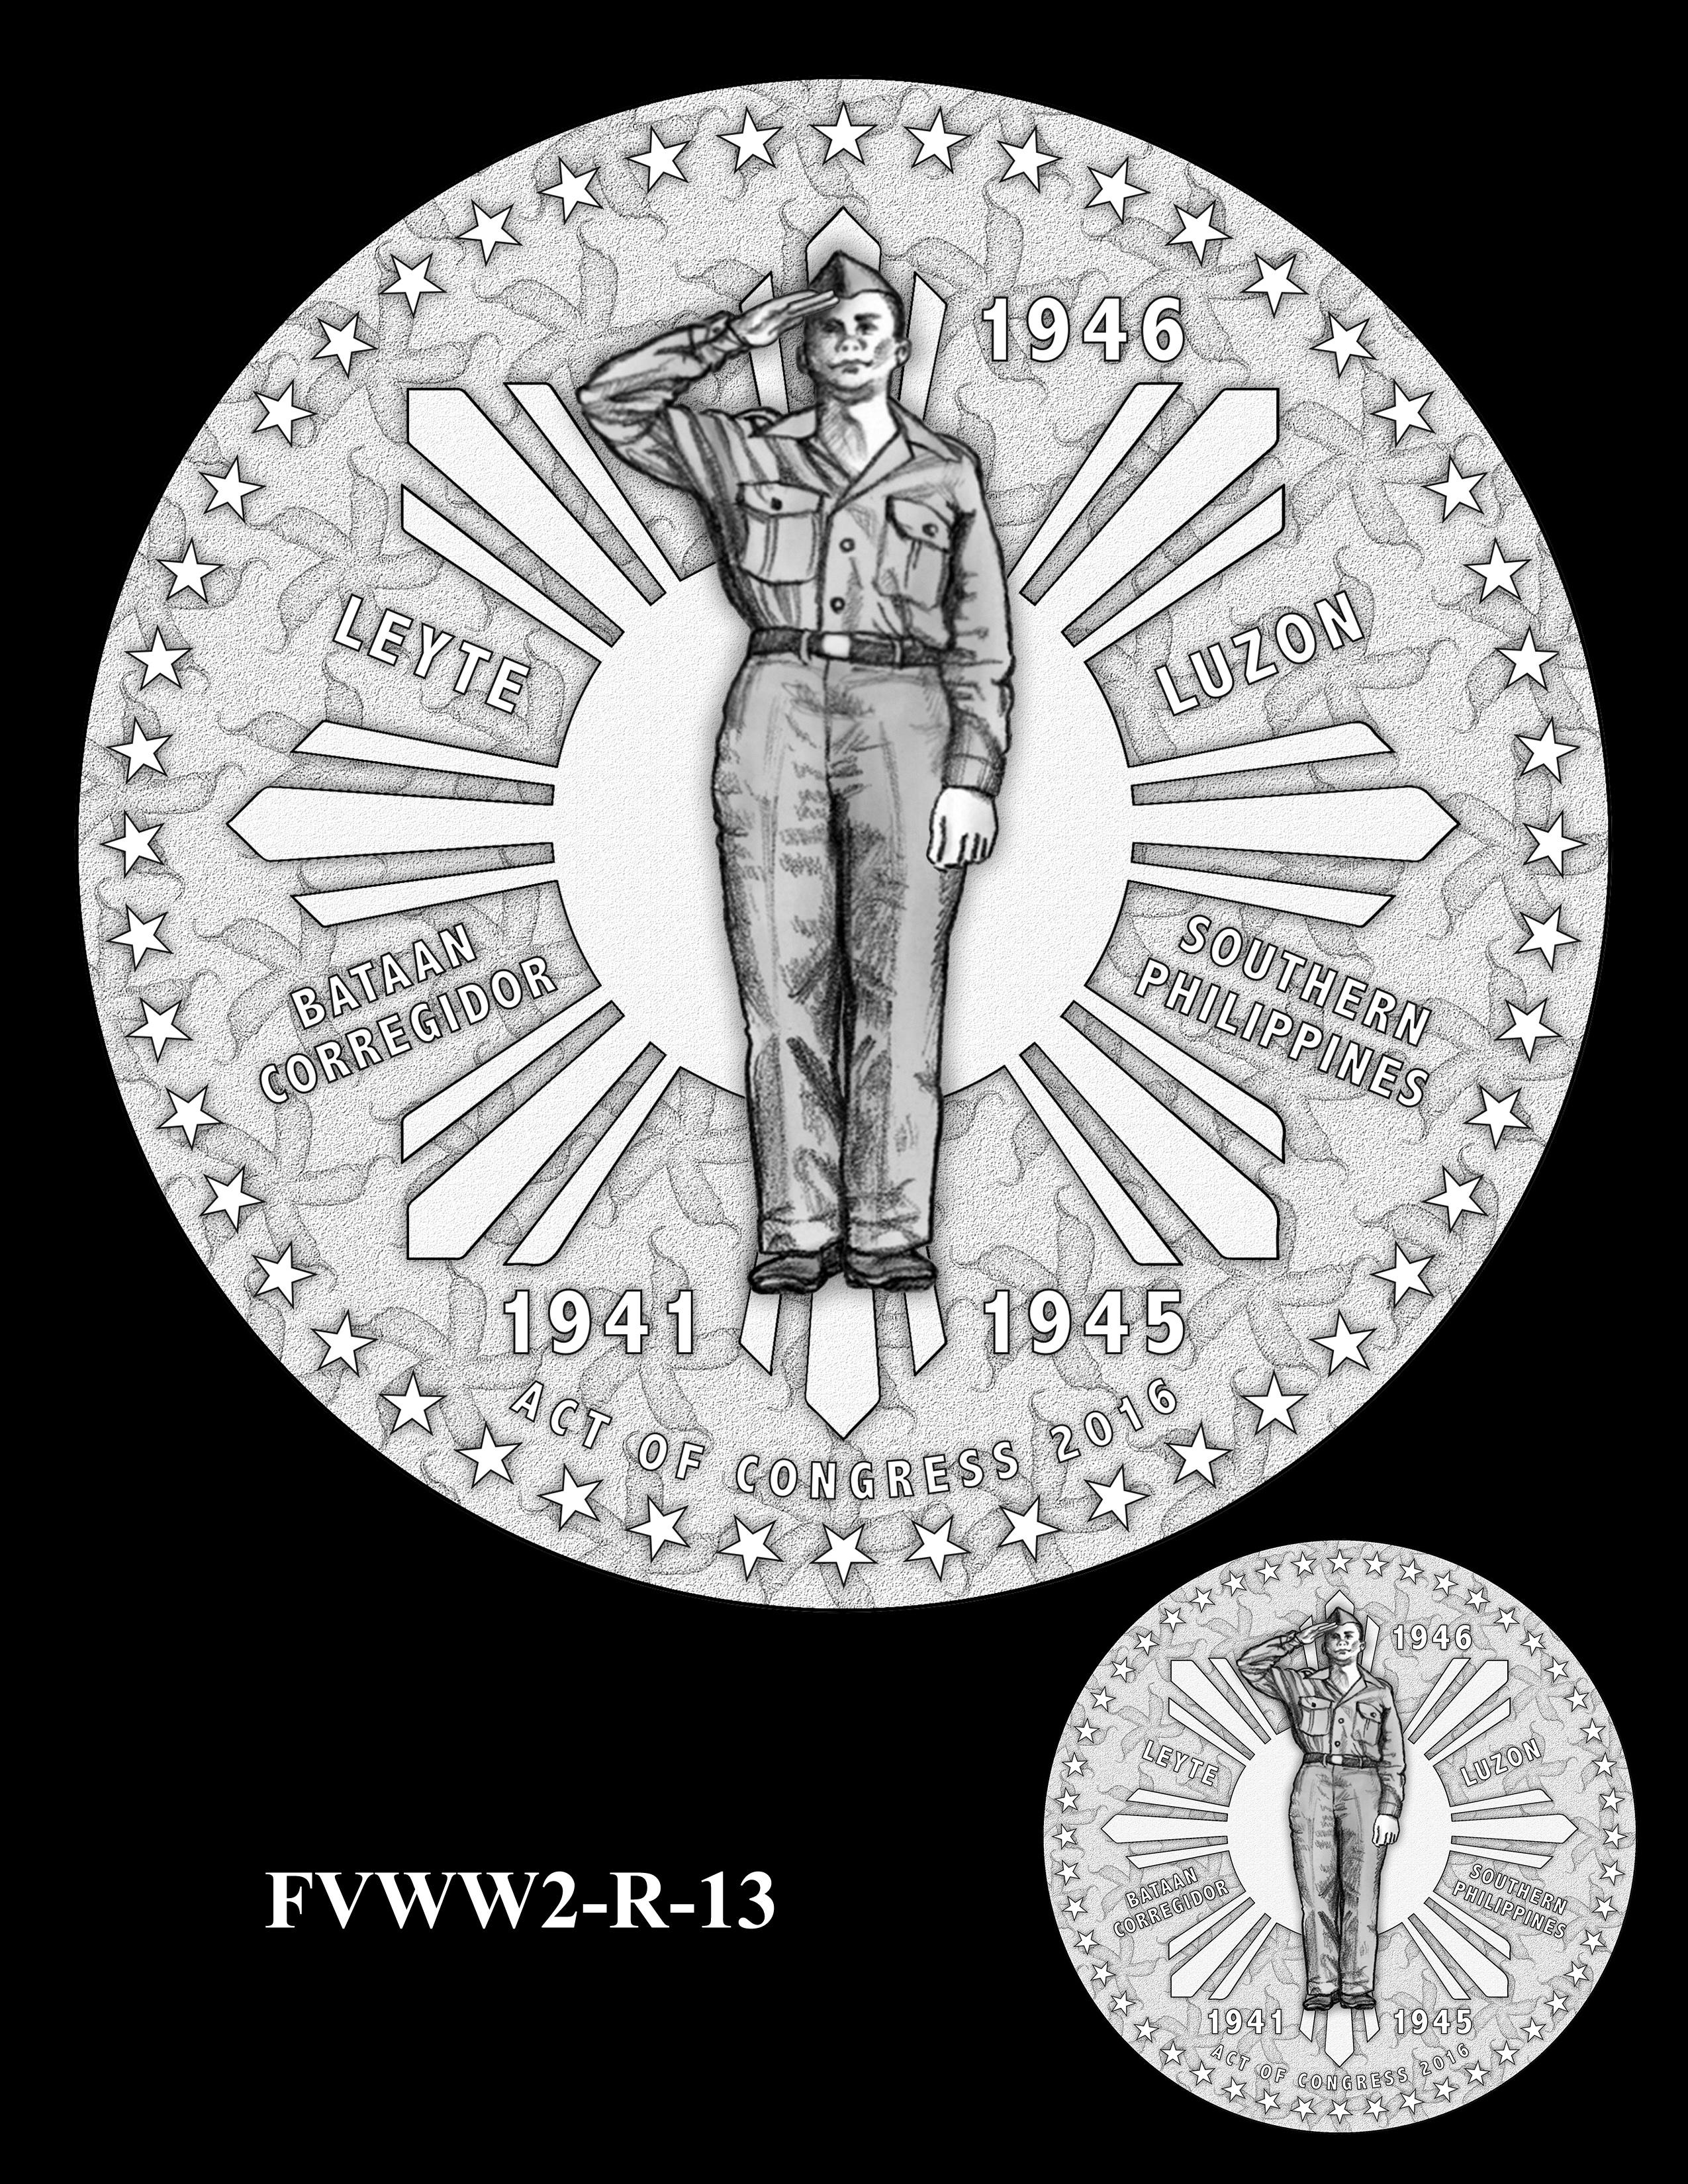 FVWW2-R-13 -- Filipino Veterans of World War II Congressional Gold Medal